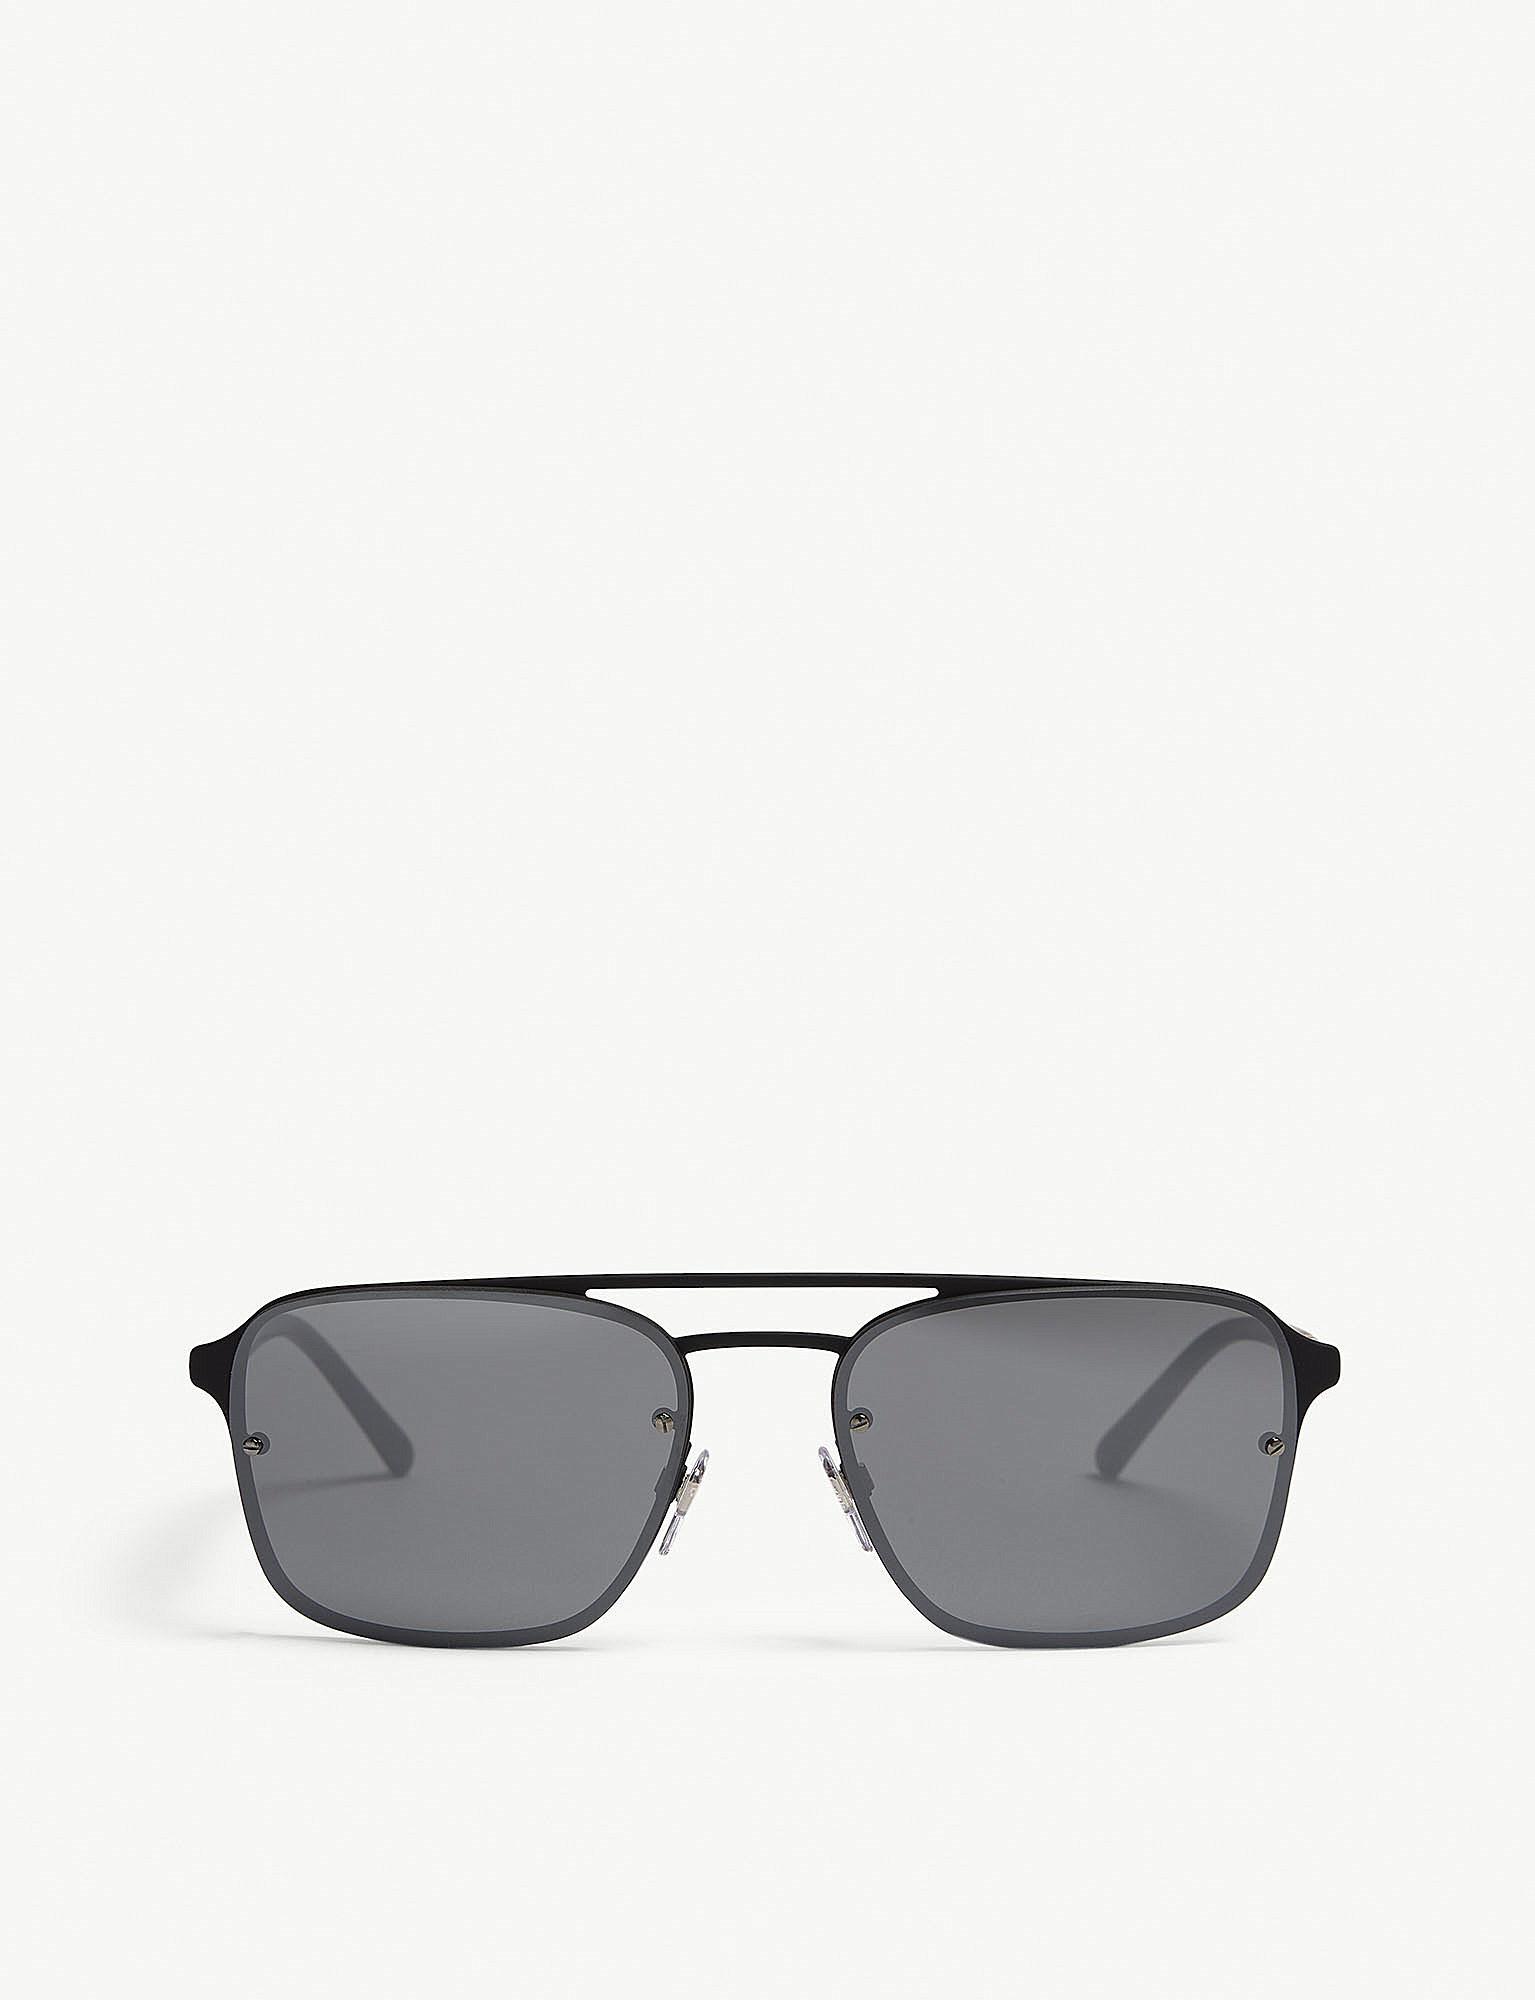 ecbf49b5ebf Lyst - Burberry Be3095 Square-frame Sunglasses in Black for Men